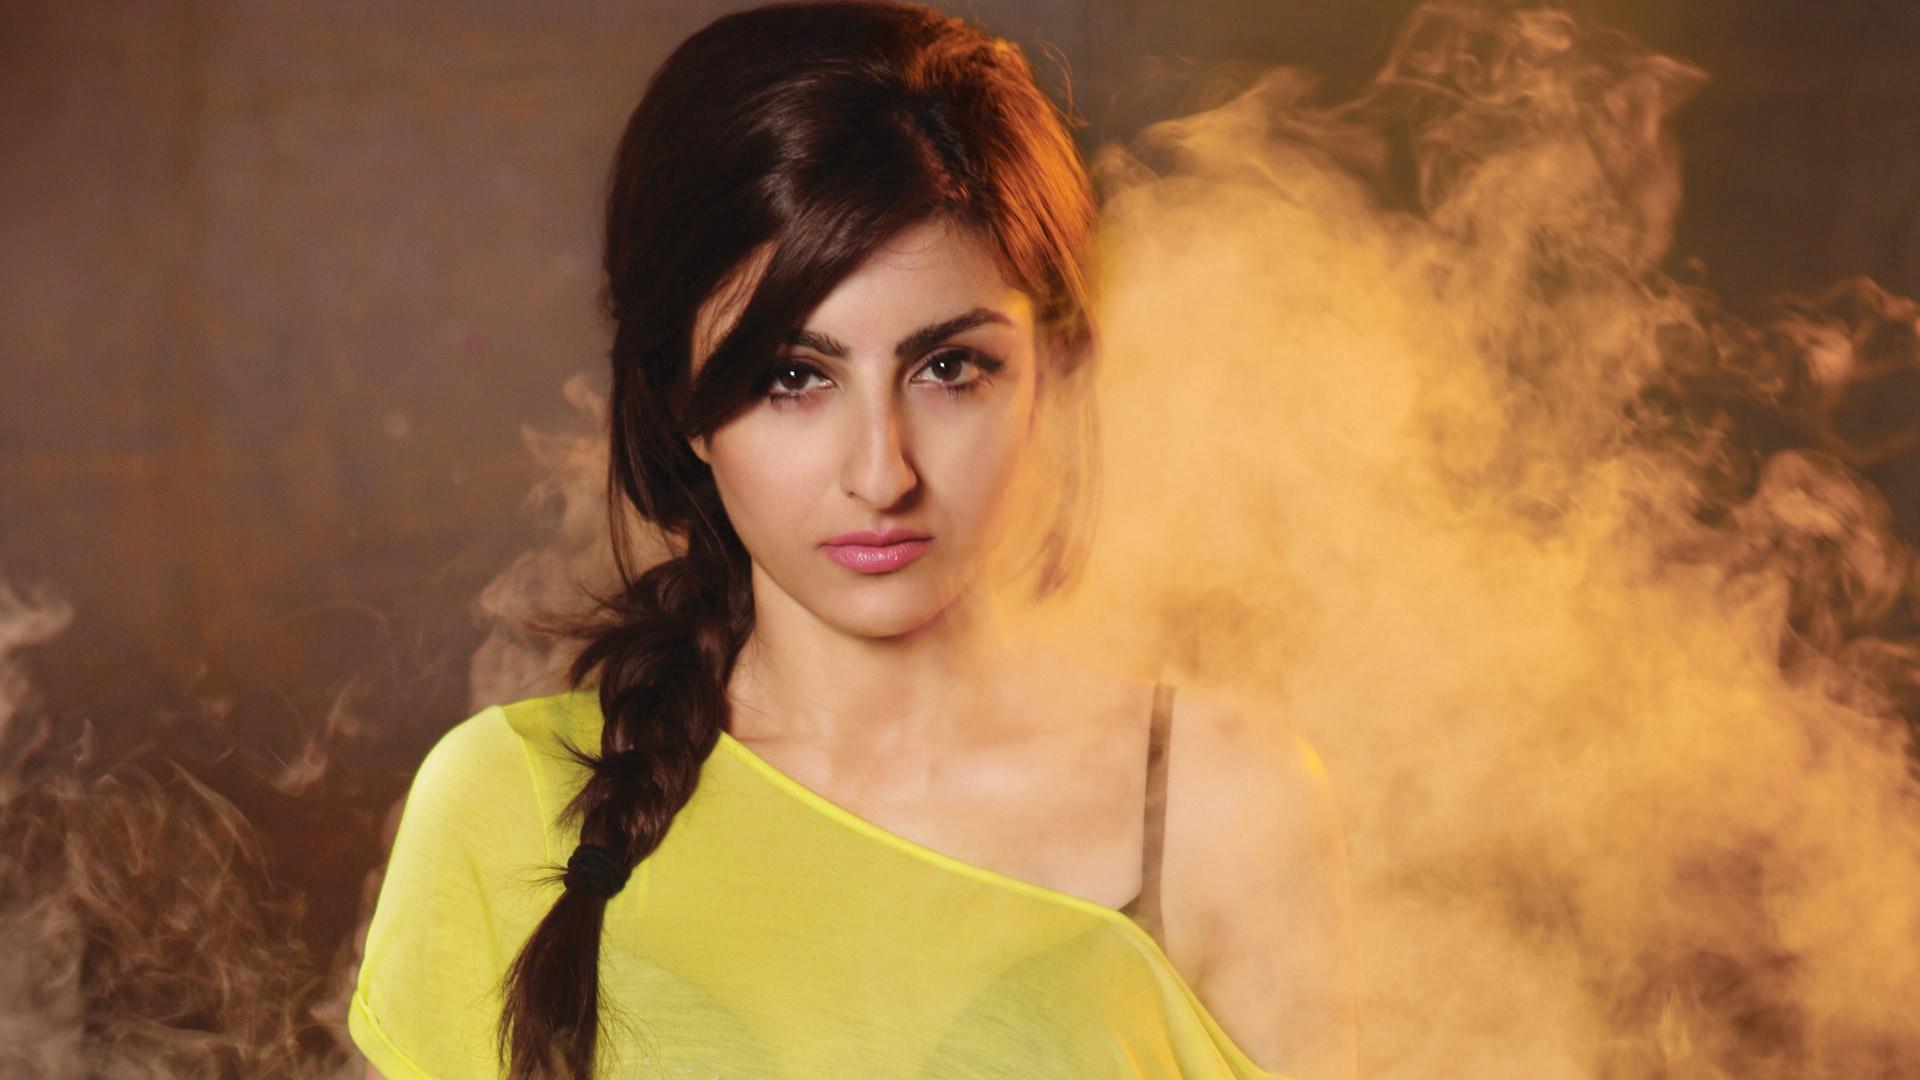 Beautiful Attitude Girl Wallpapers Soha Ali Khan Wallpapers Hd Wallpapers Id 13296